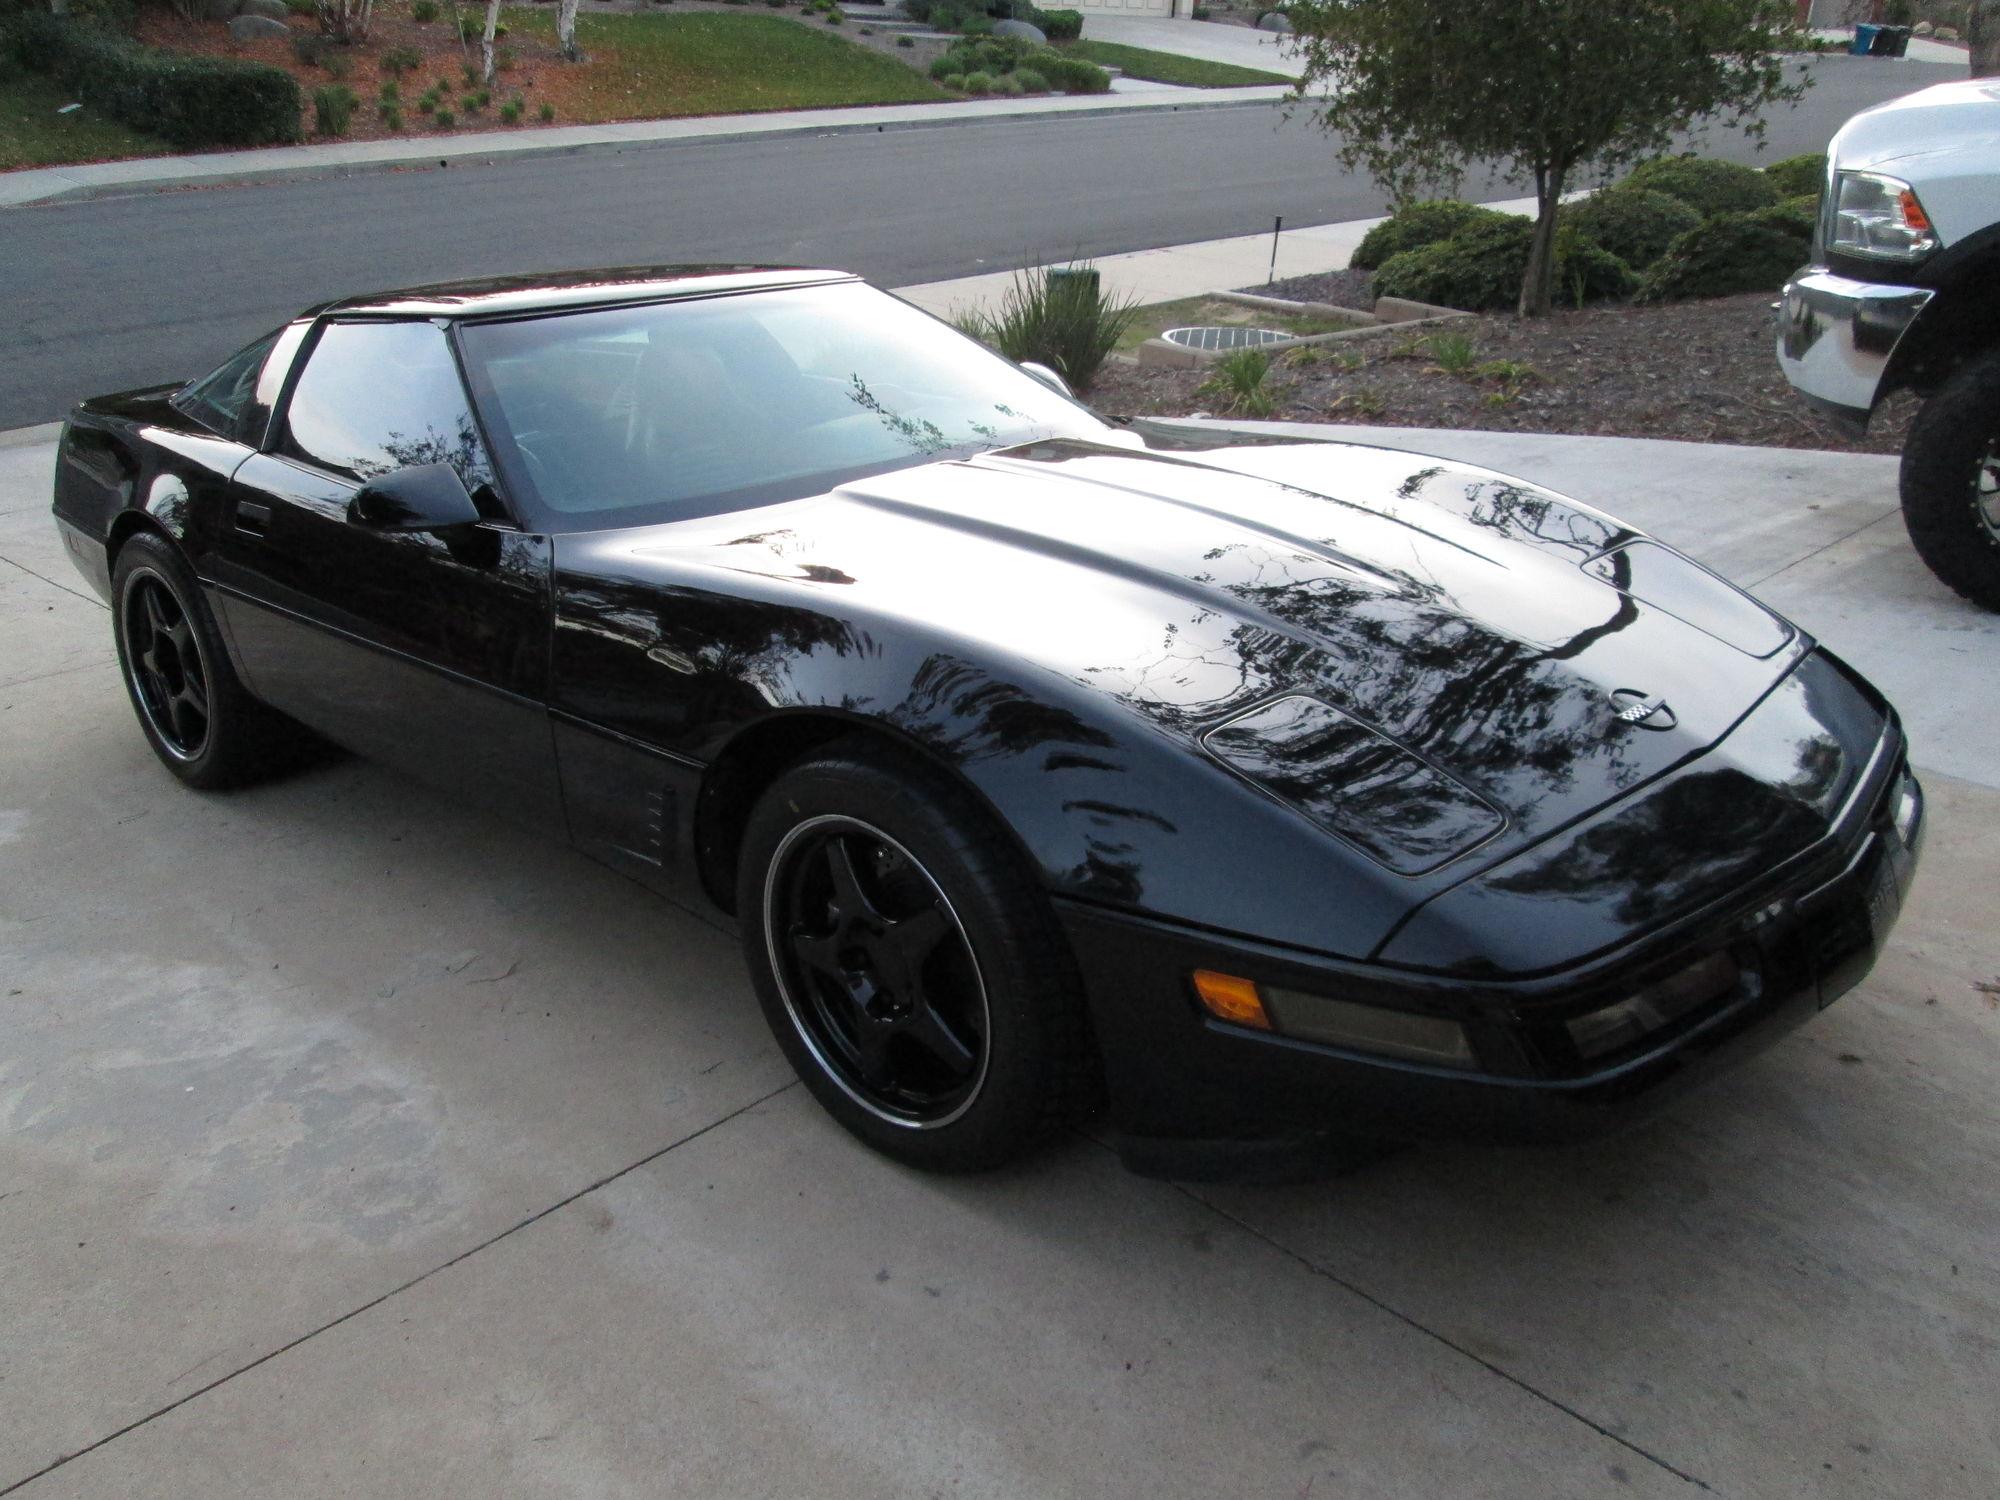 c4 corvette for sale in texas autos post. Black Bedroom Furniture Sets. Home Design Ideas